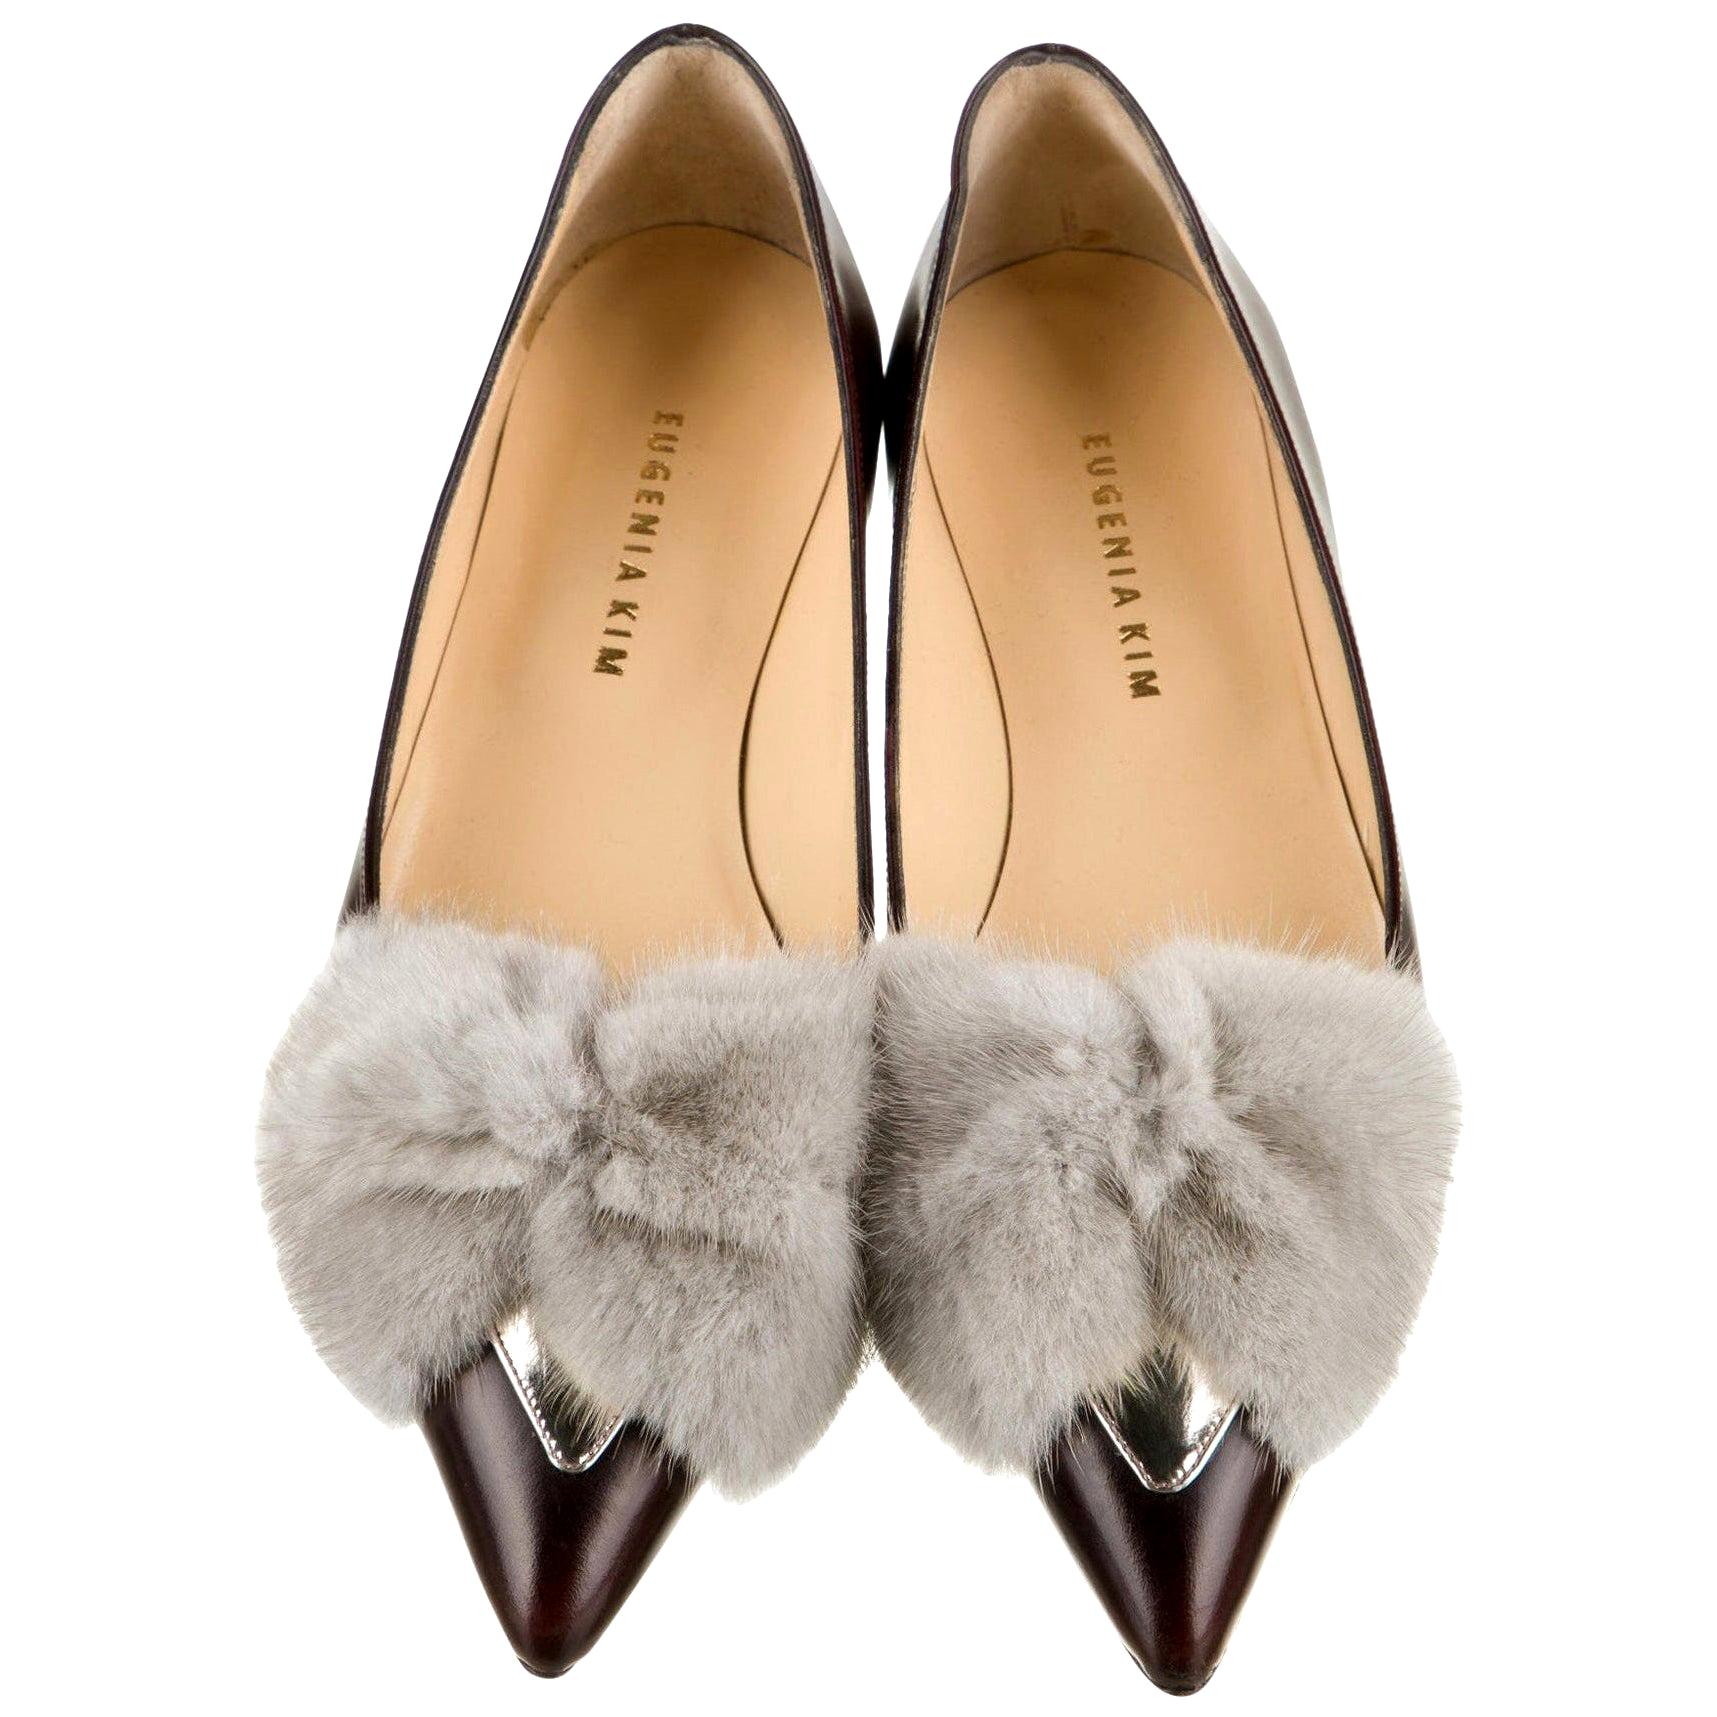 New Eugenia Kim Leather Mink Pointed Toe Flats Shoes Sz 39  U.S. 8.5